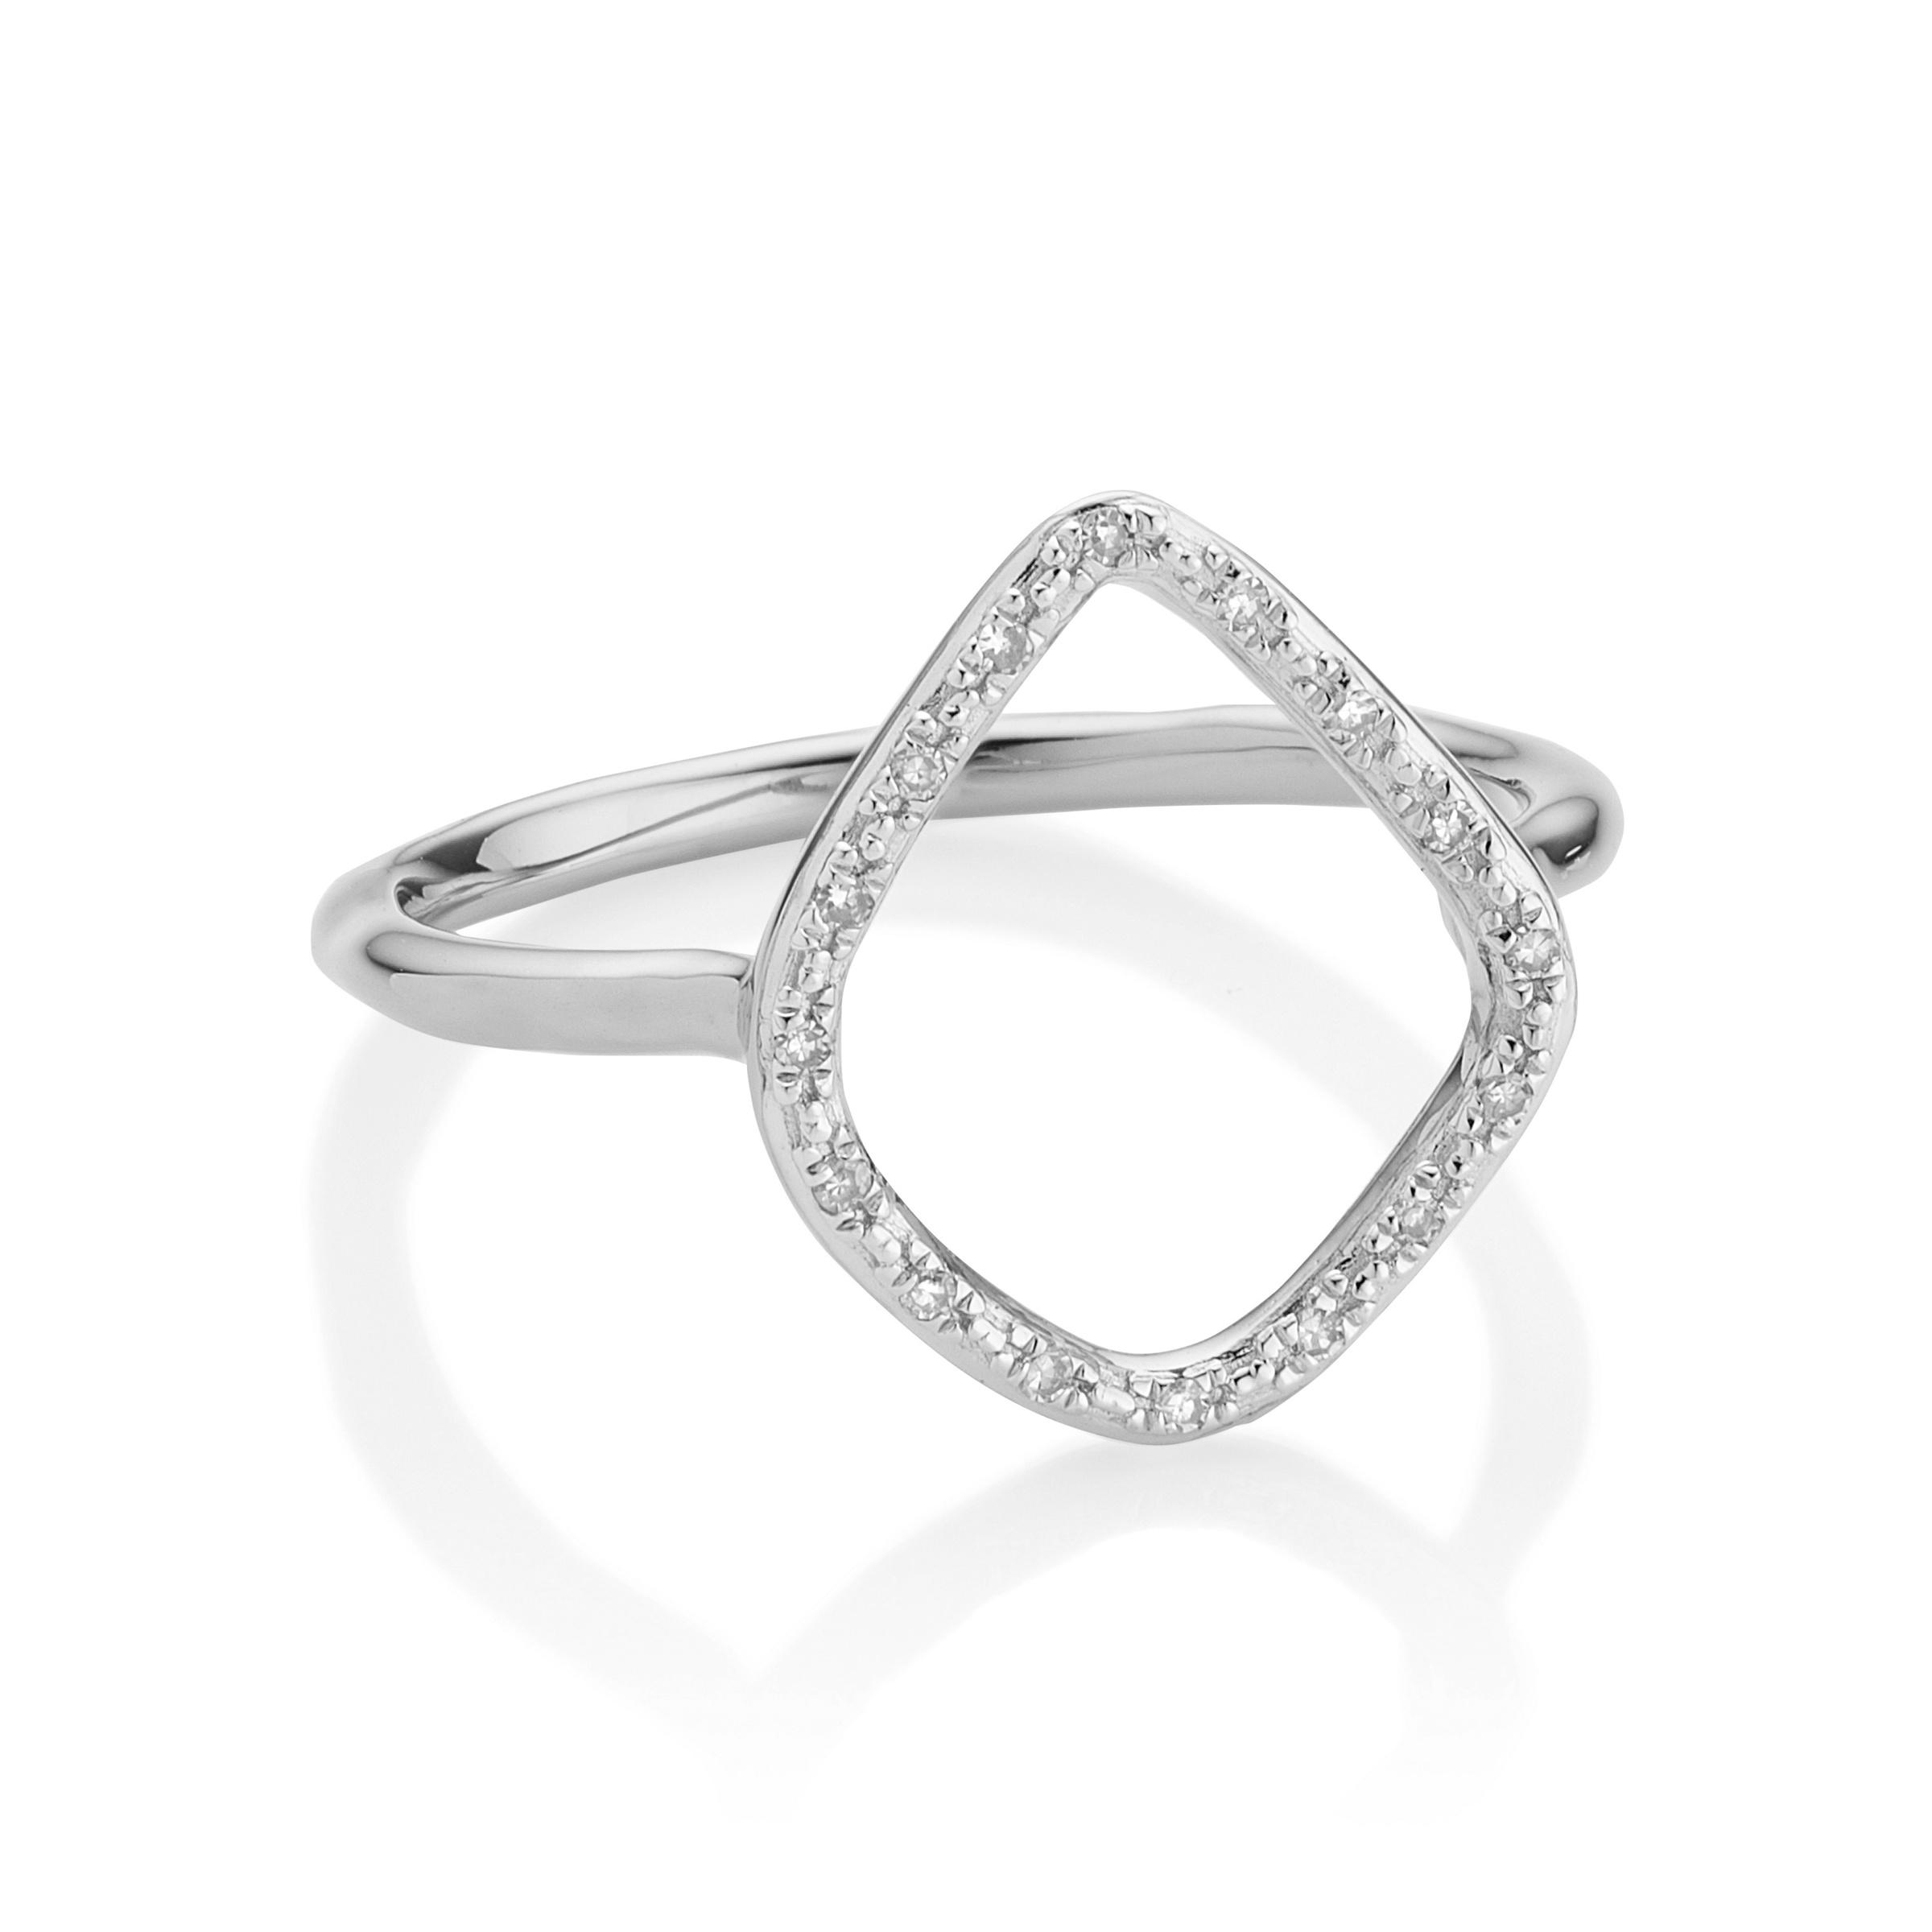 Riva Diamond Hoop Earrings, Rose Gold Vermeil on Silver Monica Vinader